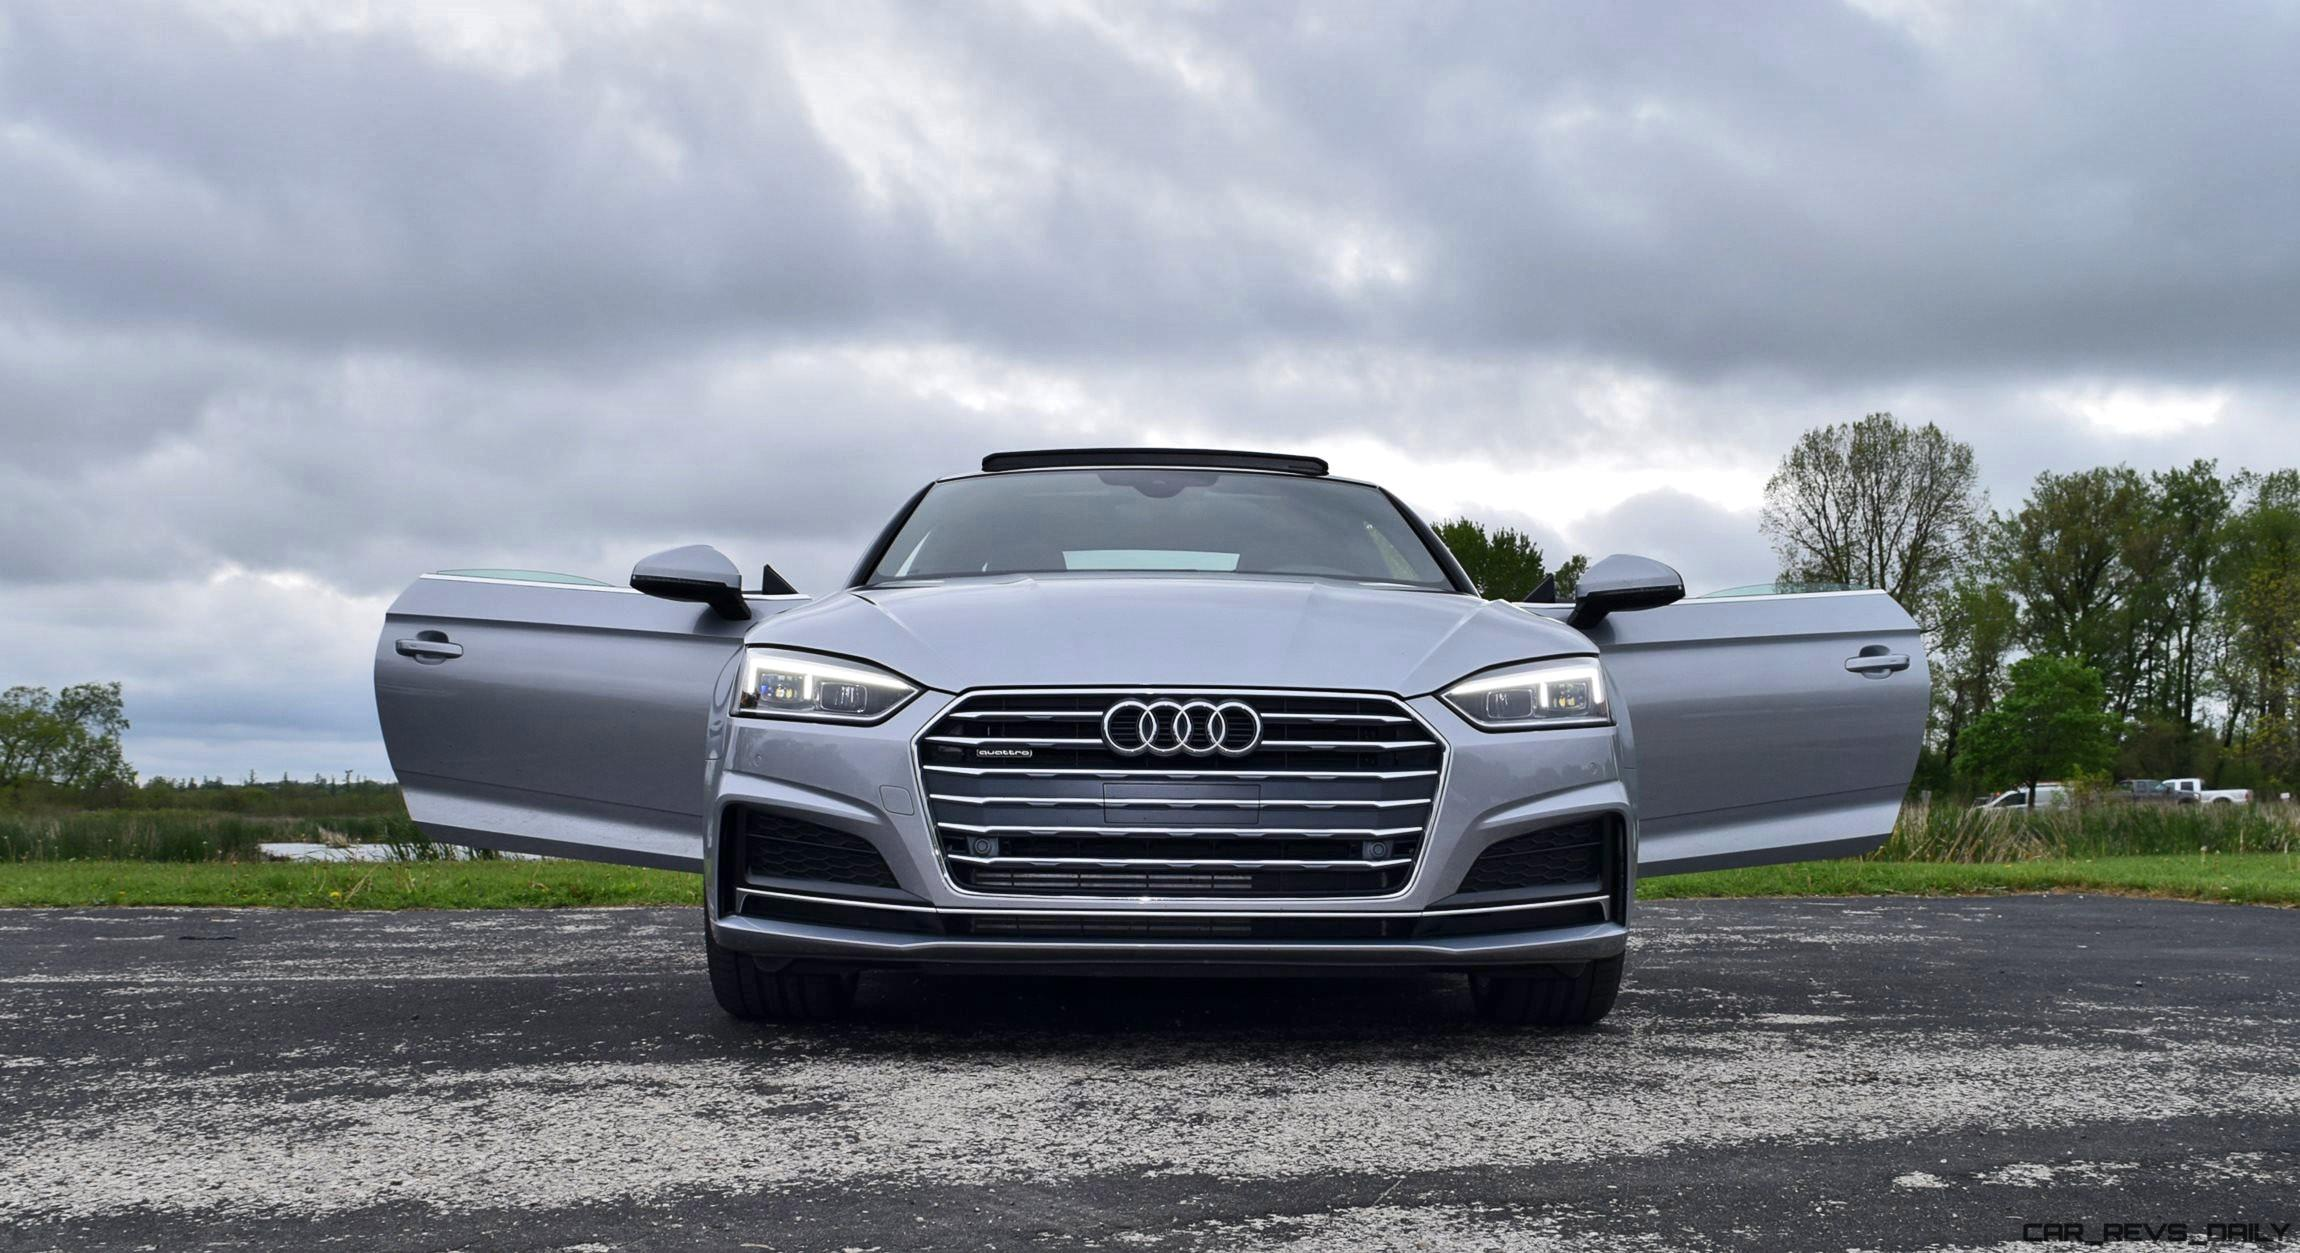 Audi A5 2.0 T >> First Drive - 2018 Audi A5 2.0T S-Line Quattro Coupe » CAR ...